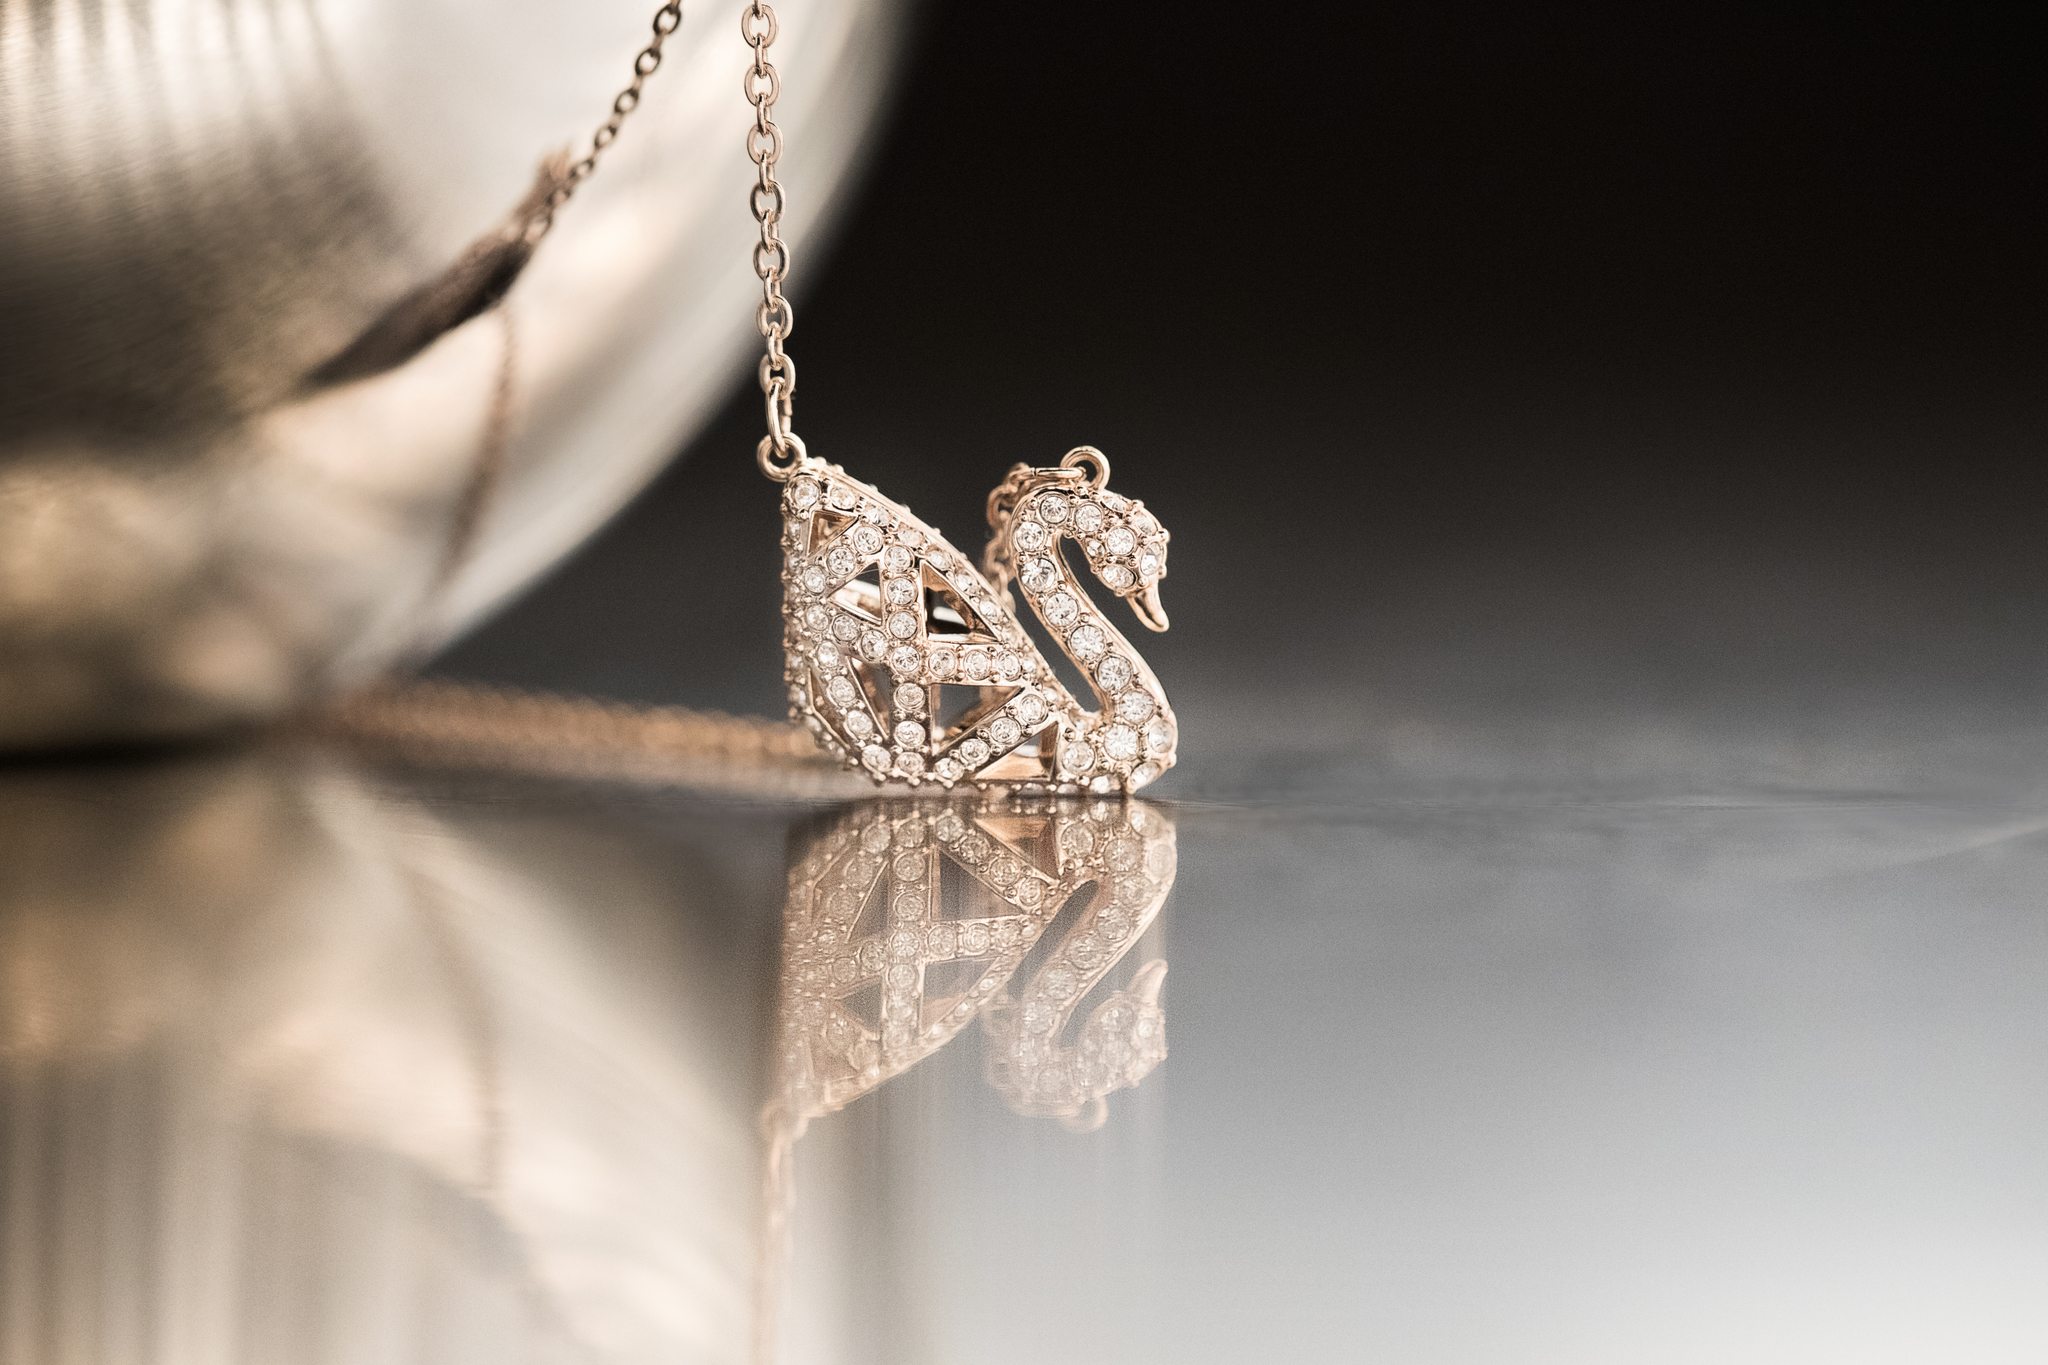 swarovski-jewellery-partnership-opportunity-6